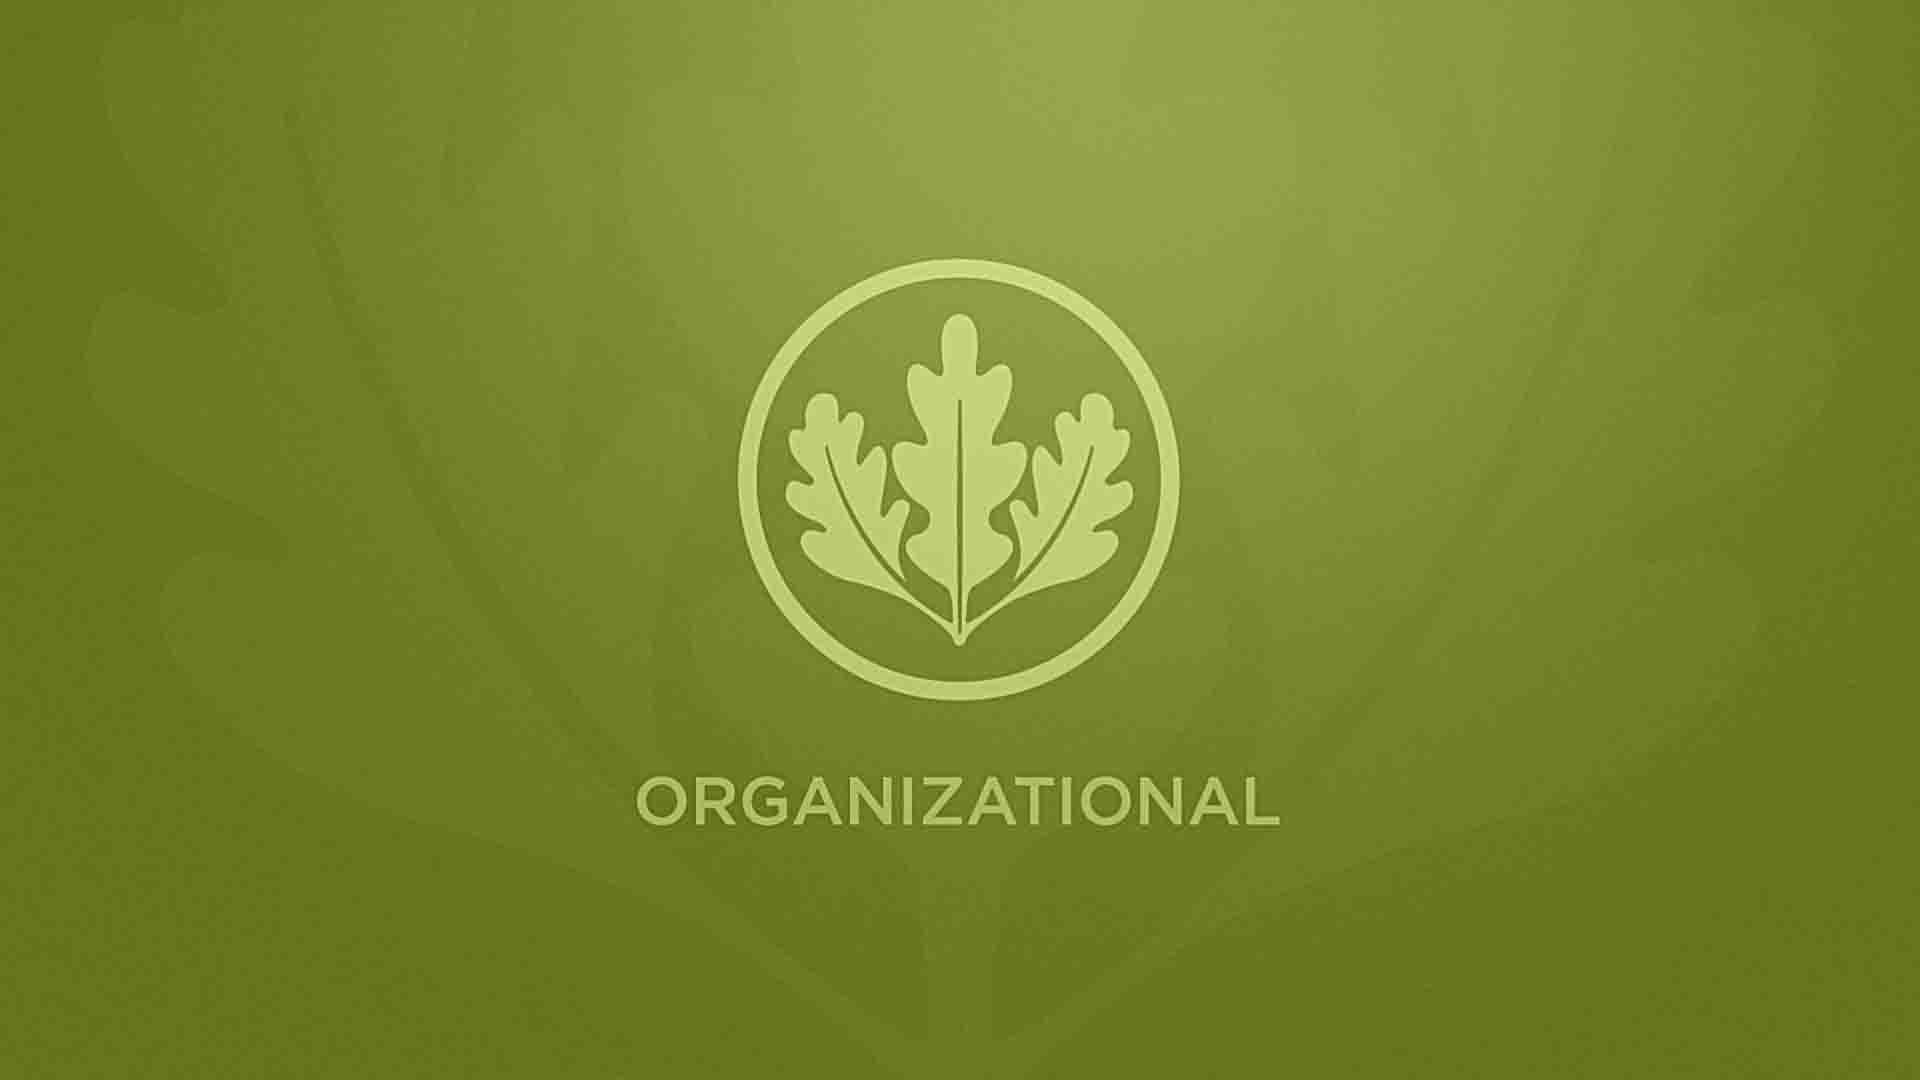 LEAF Member Organizations